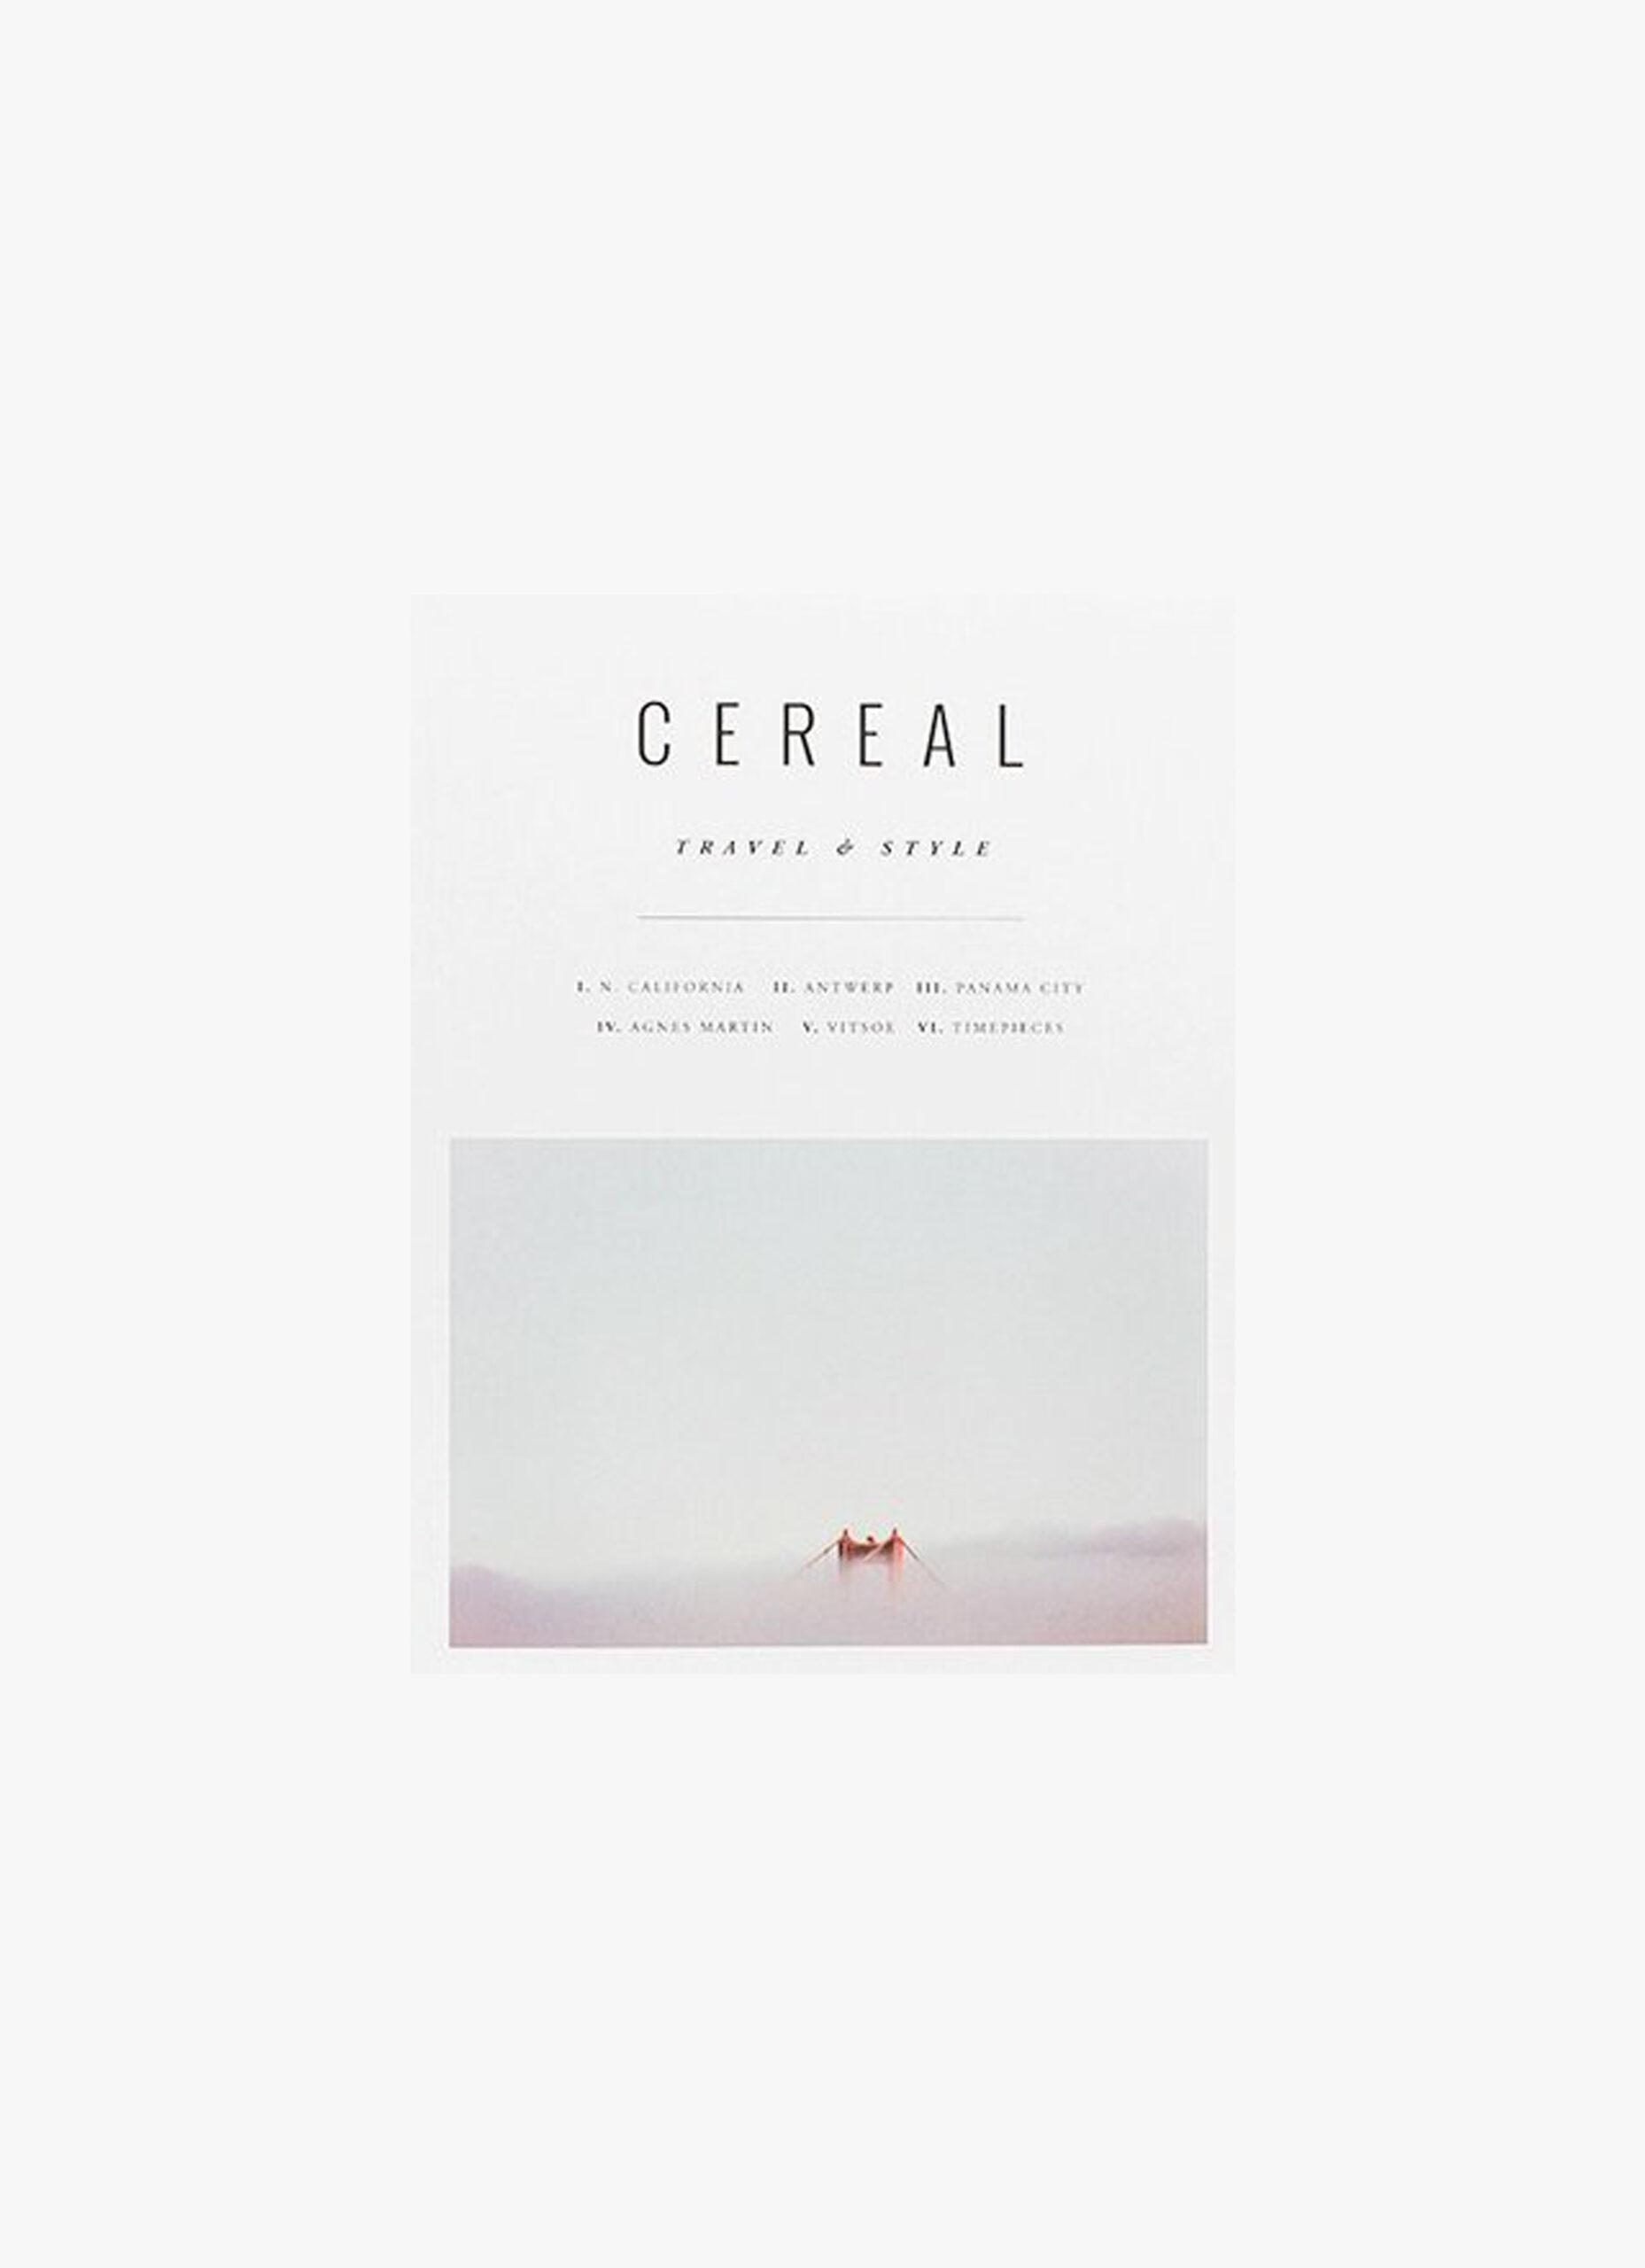 Cereal Magazine Volume 10